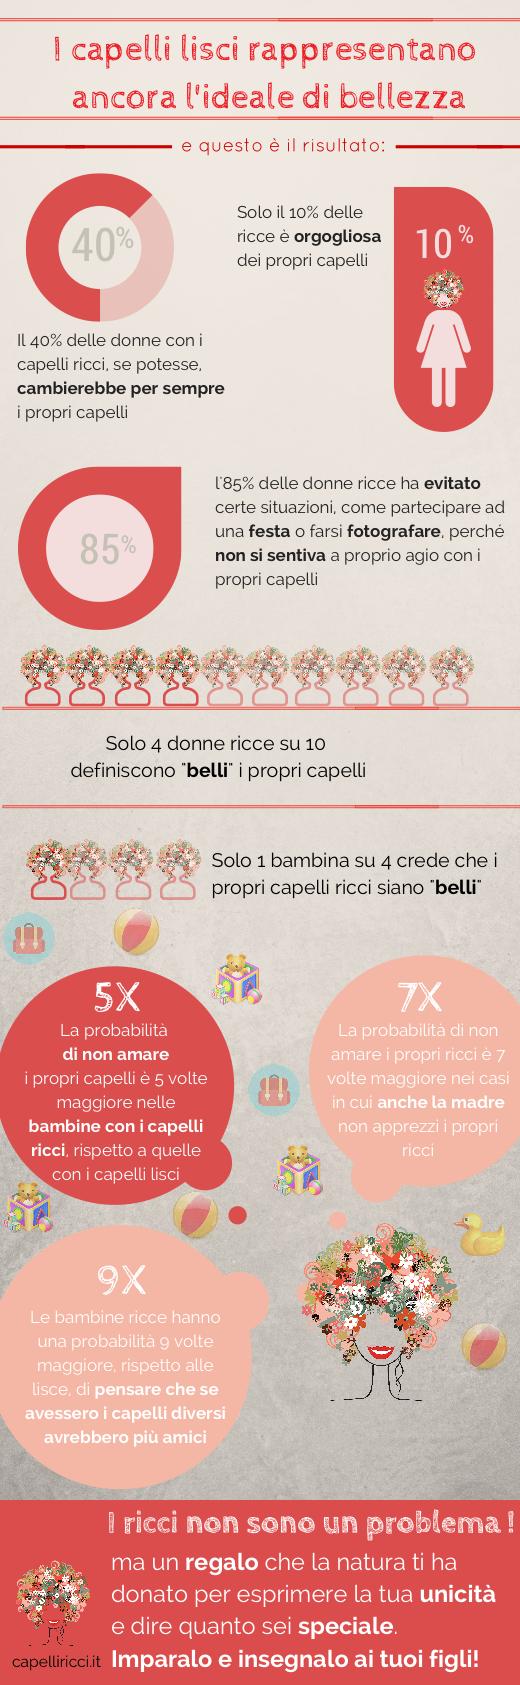 Infografica ricerca